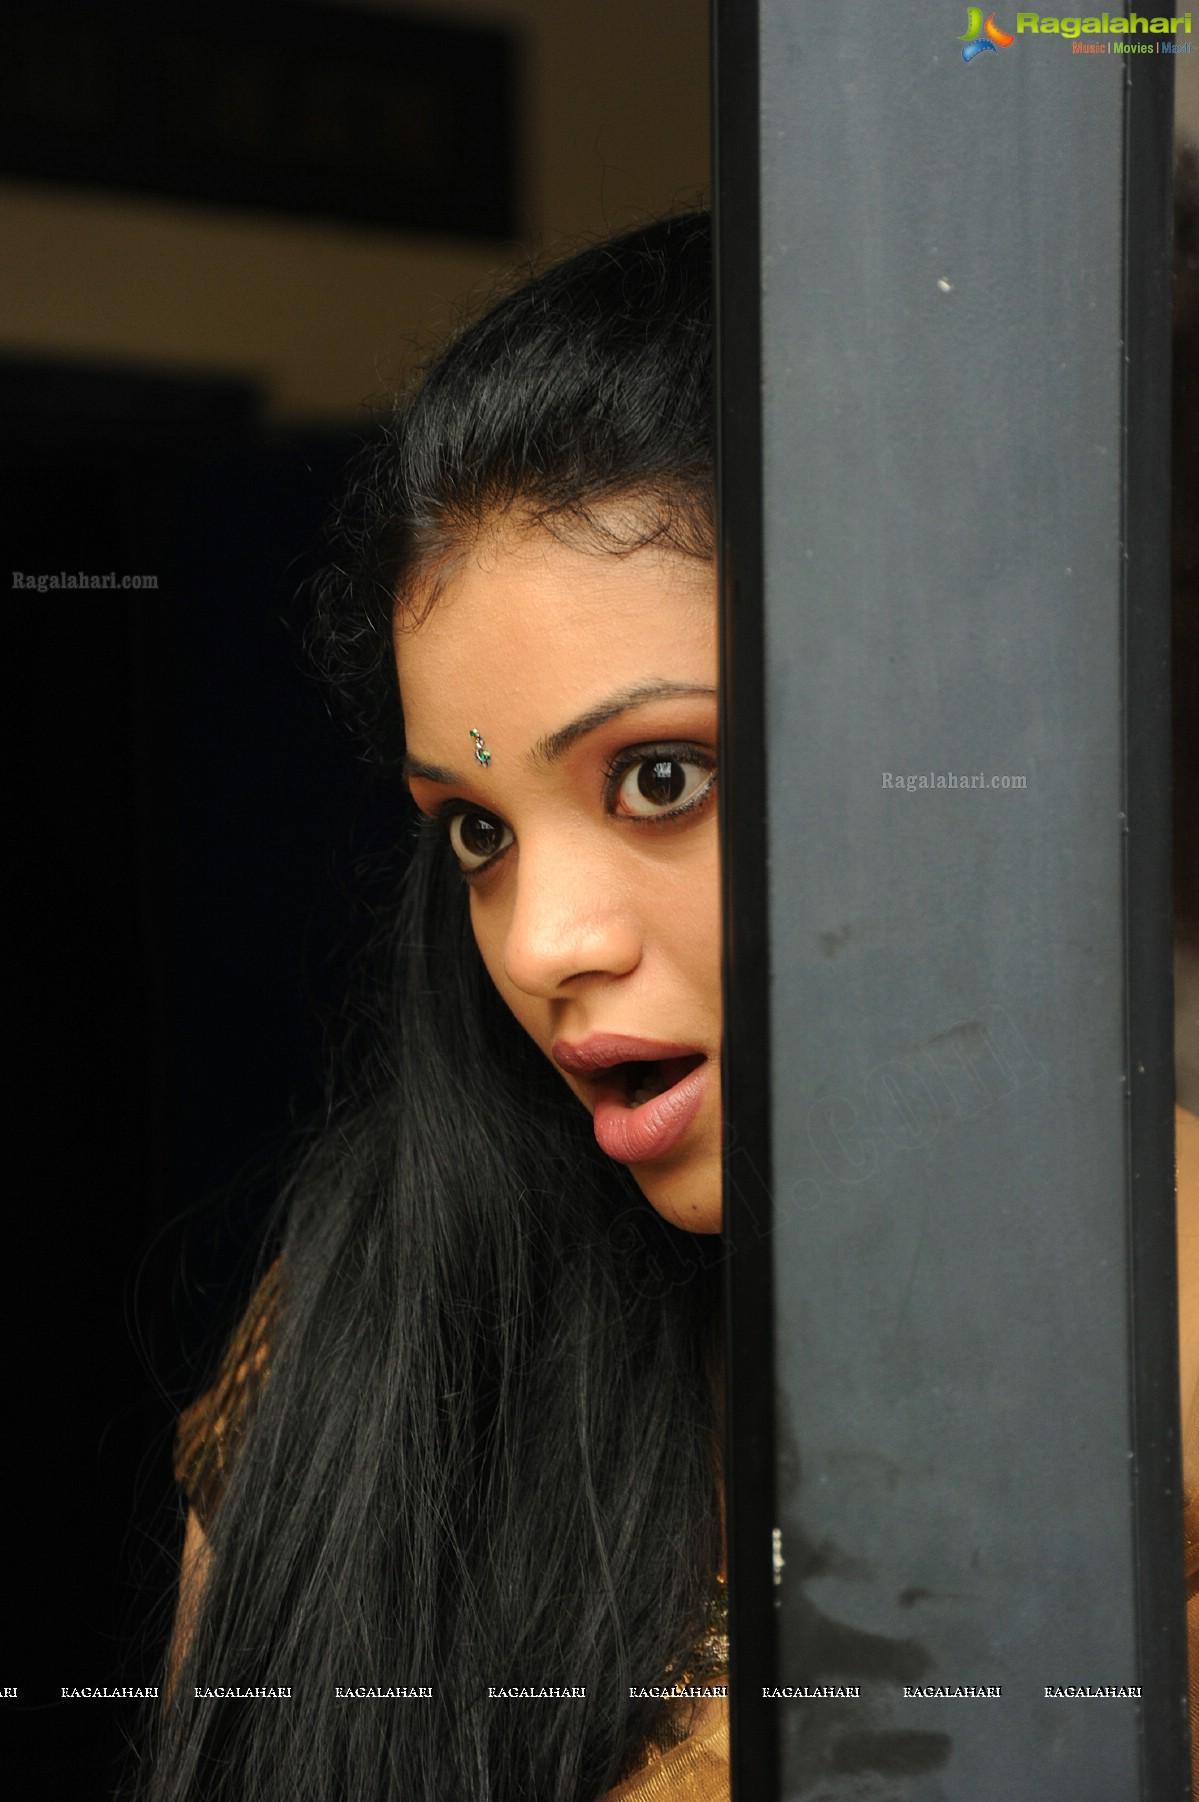 supraja image 24 | telugu heroines posters,images, photos, pictures